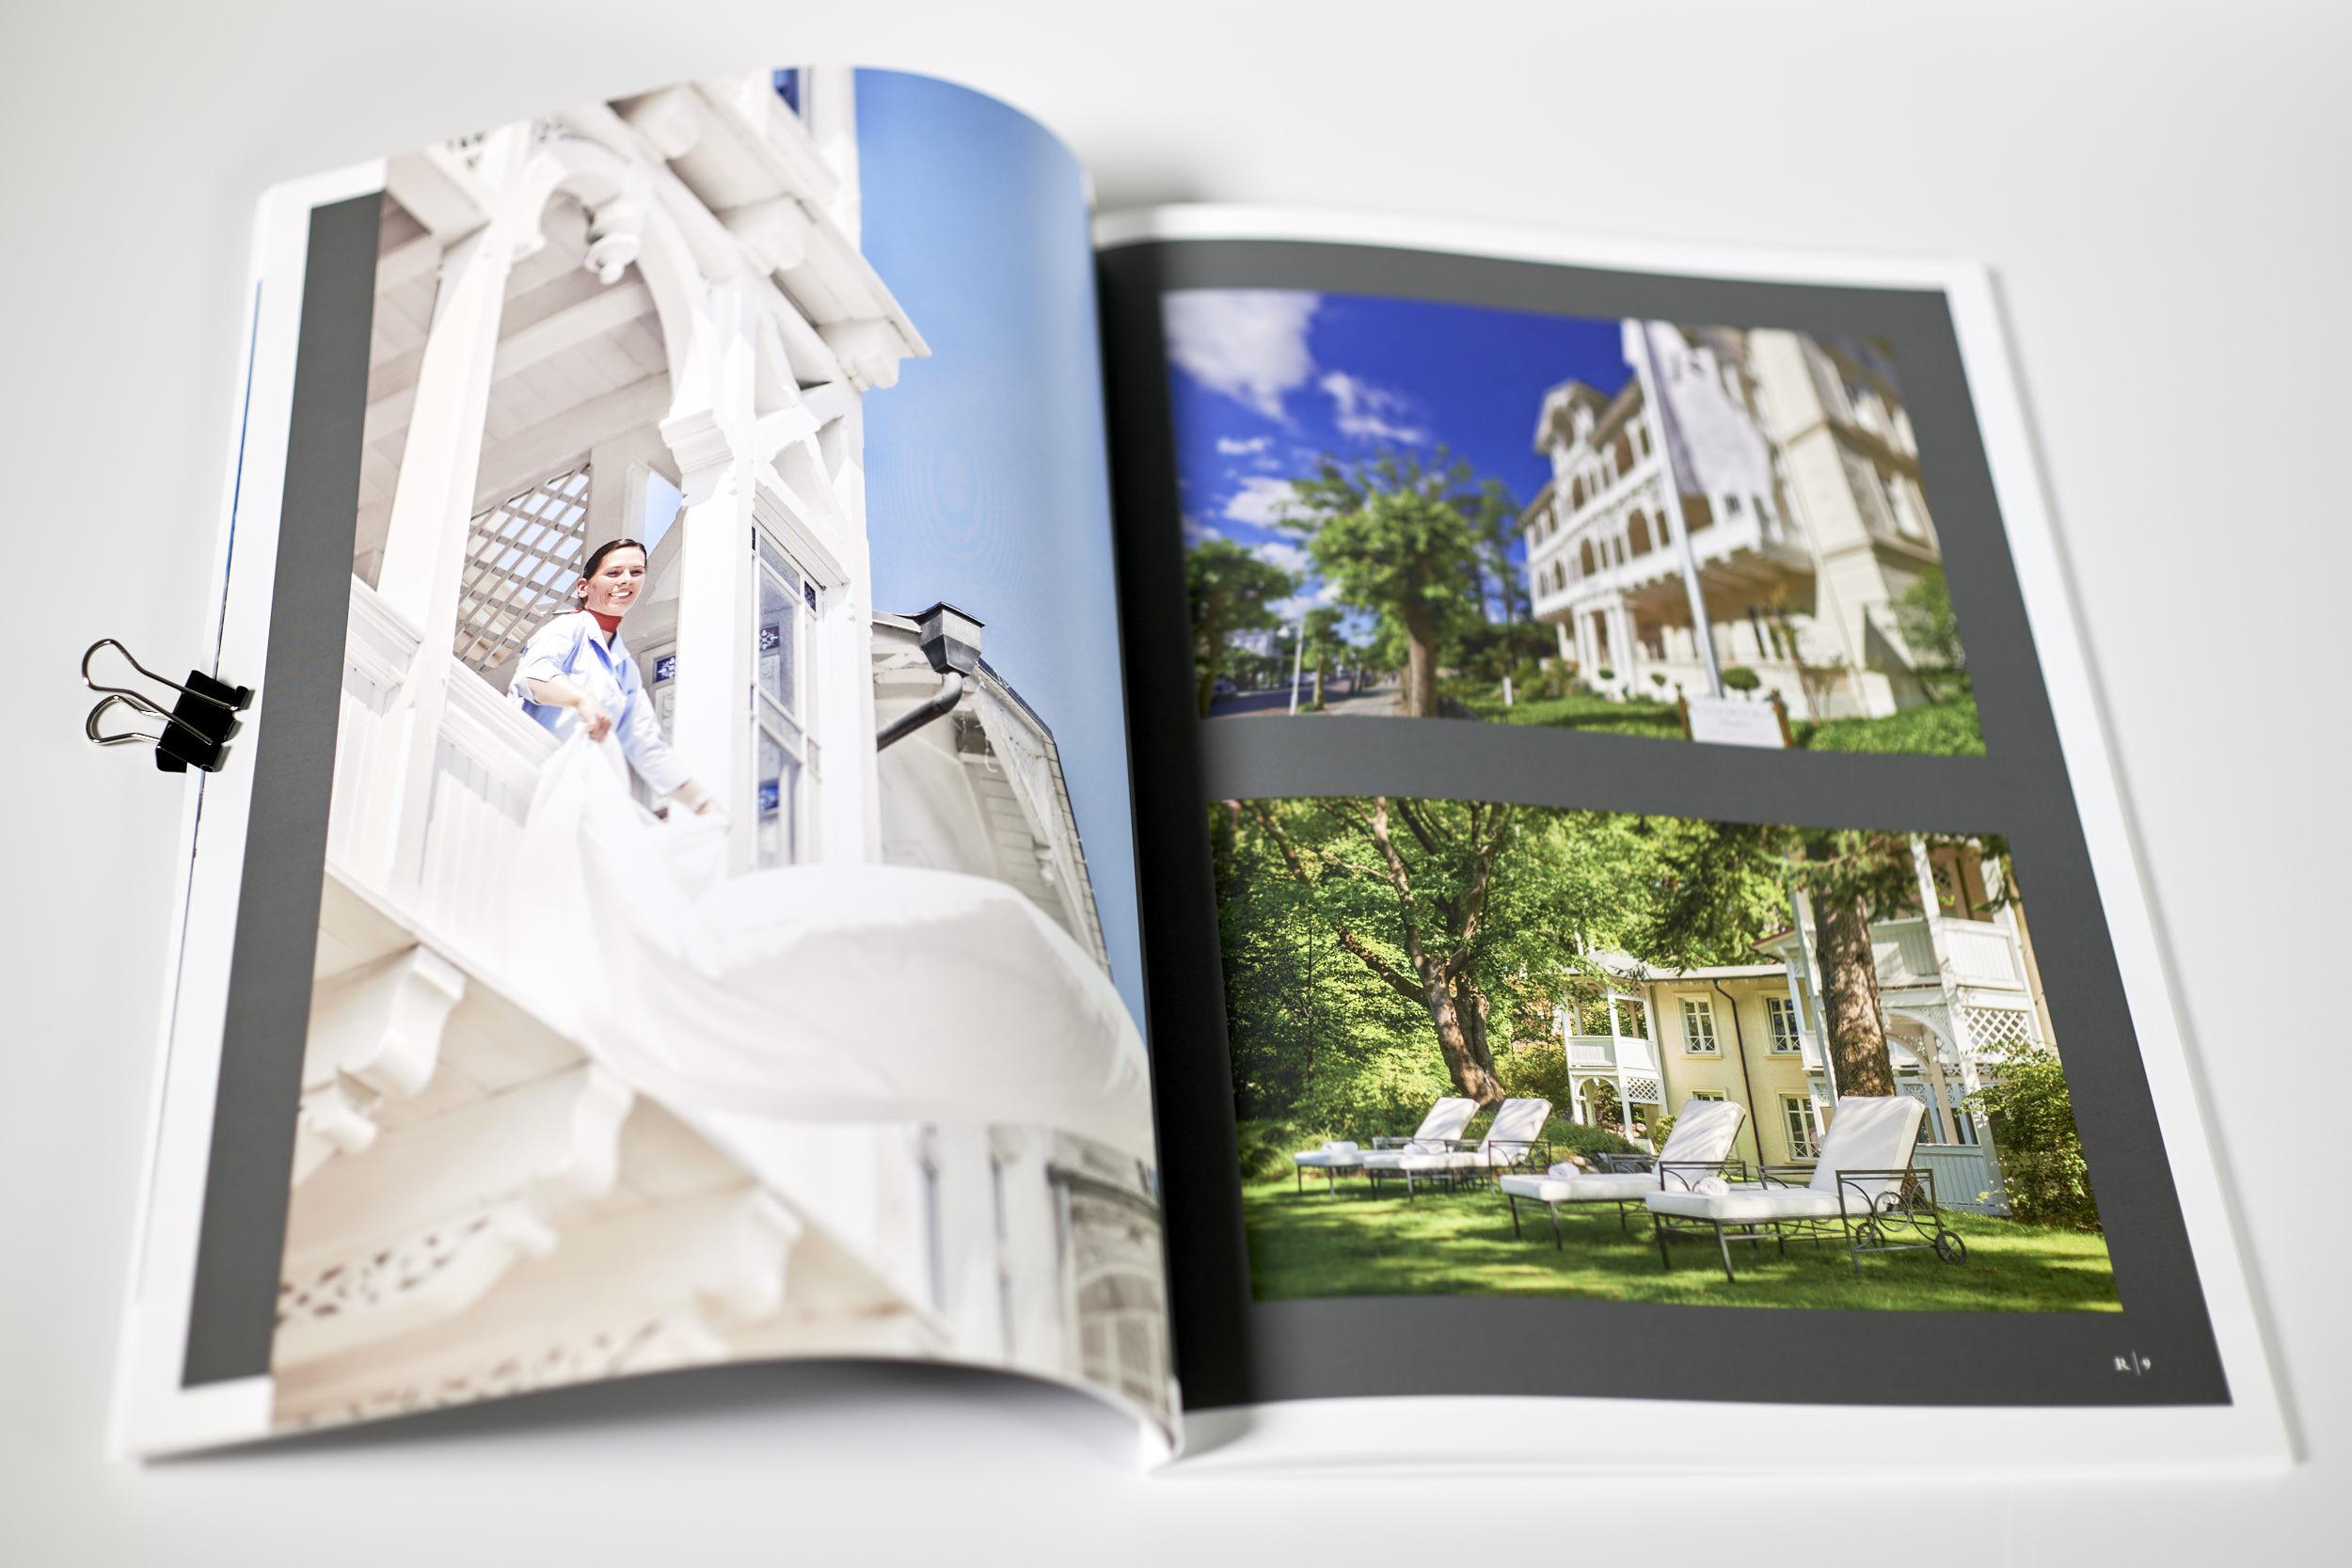 Grafikdesign-Pocha-Burwitz-Foto-Pocha-Burwitz 12